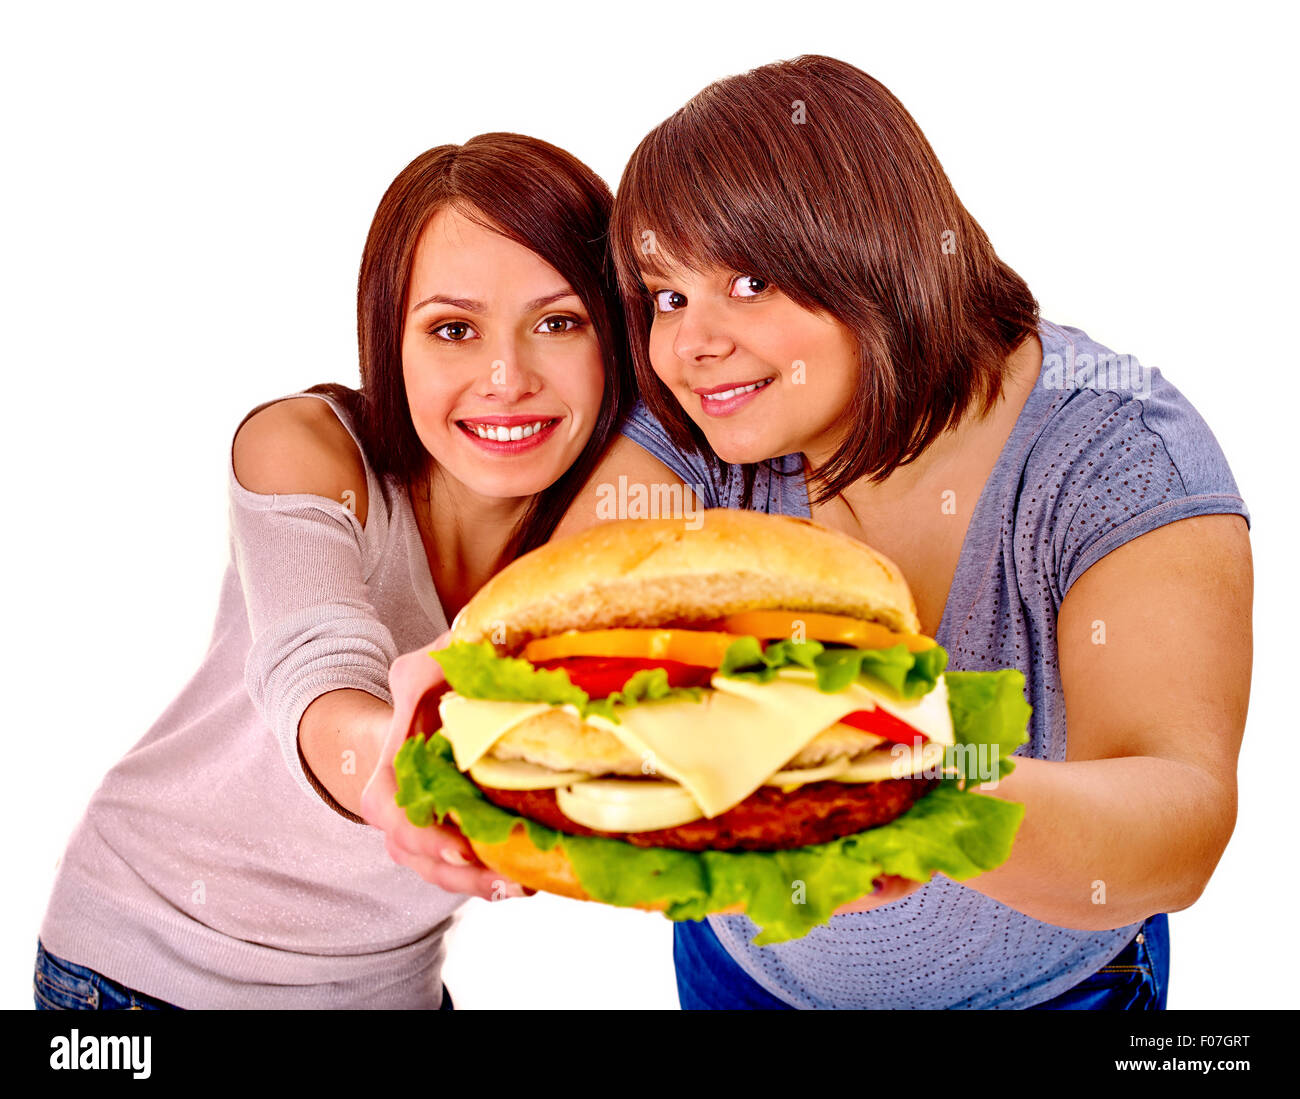 Women eating hamburger. - Stock Image